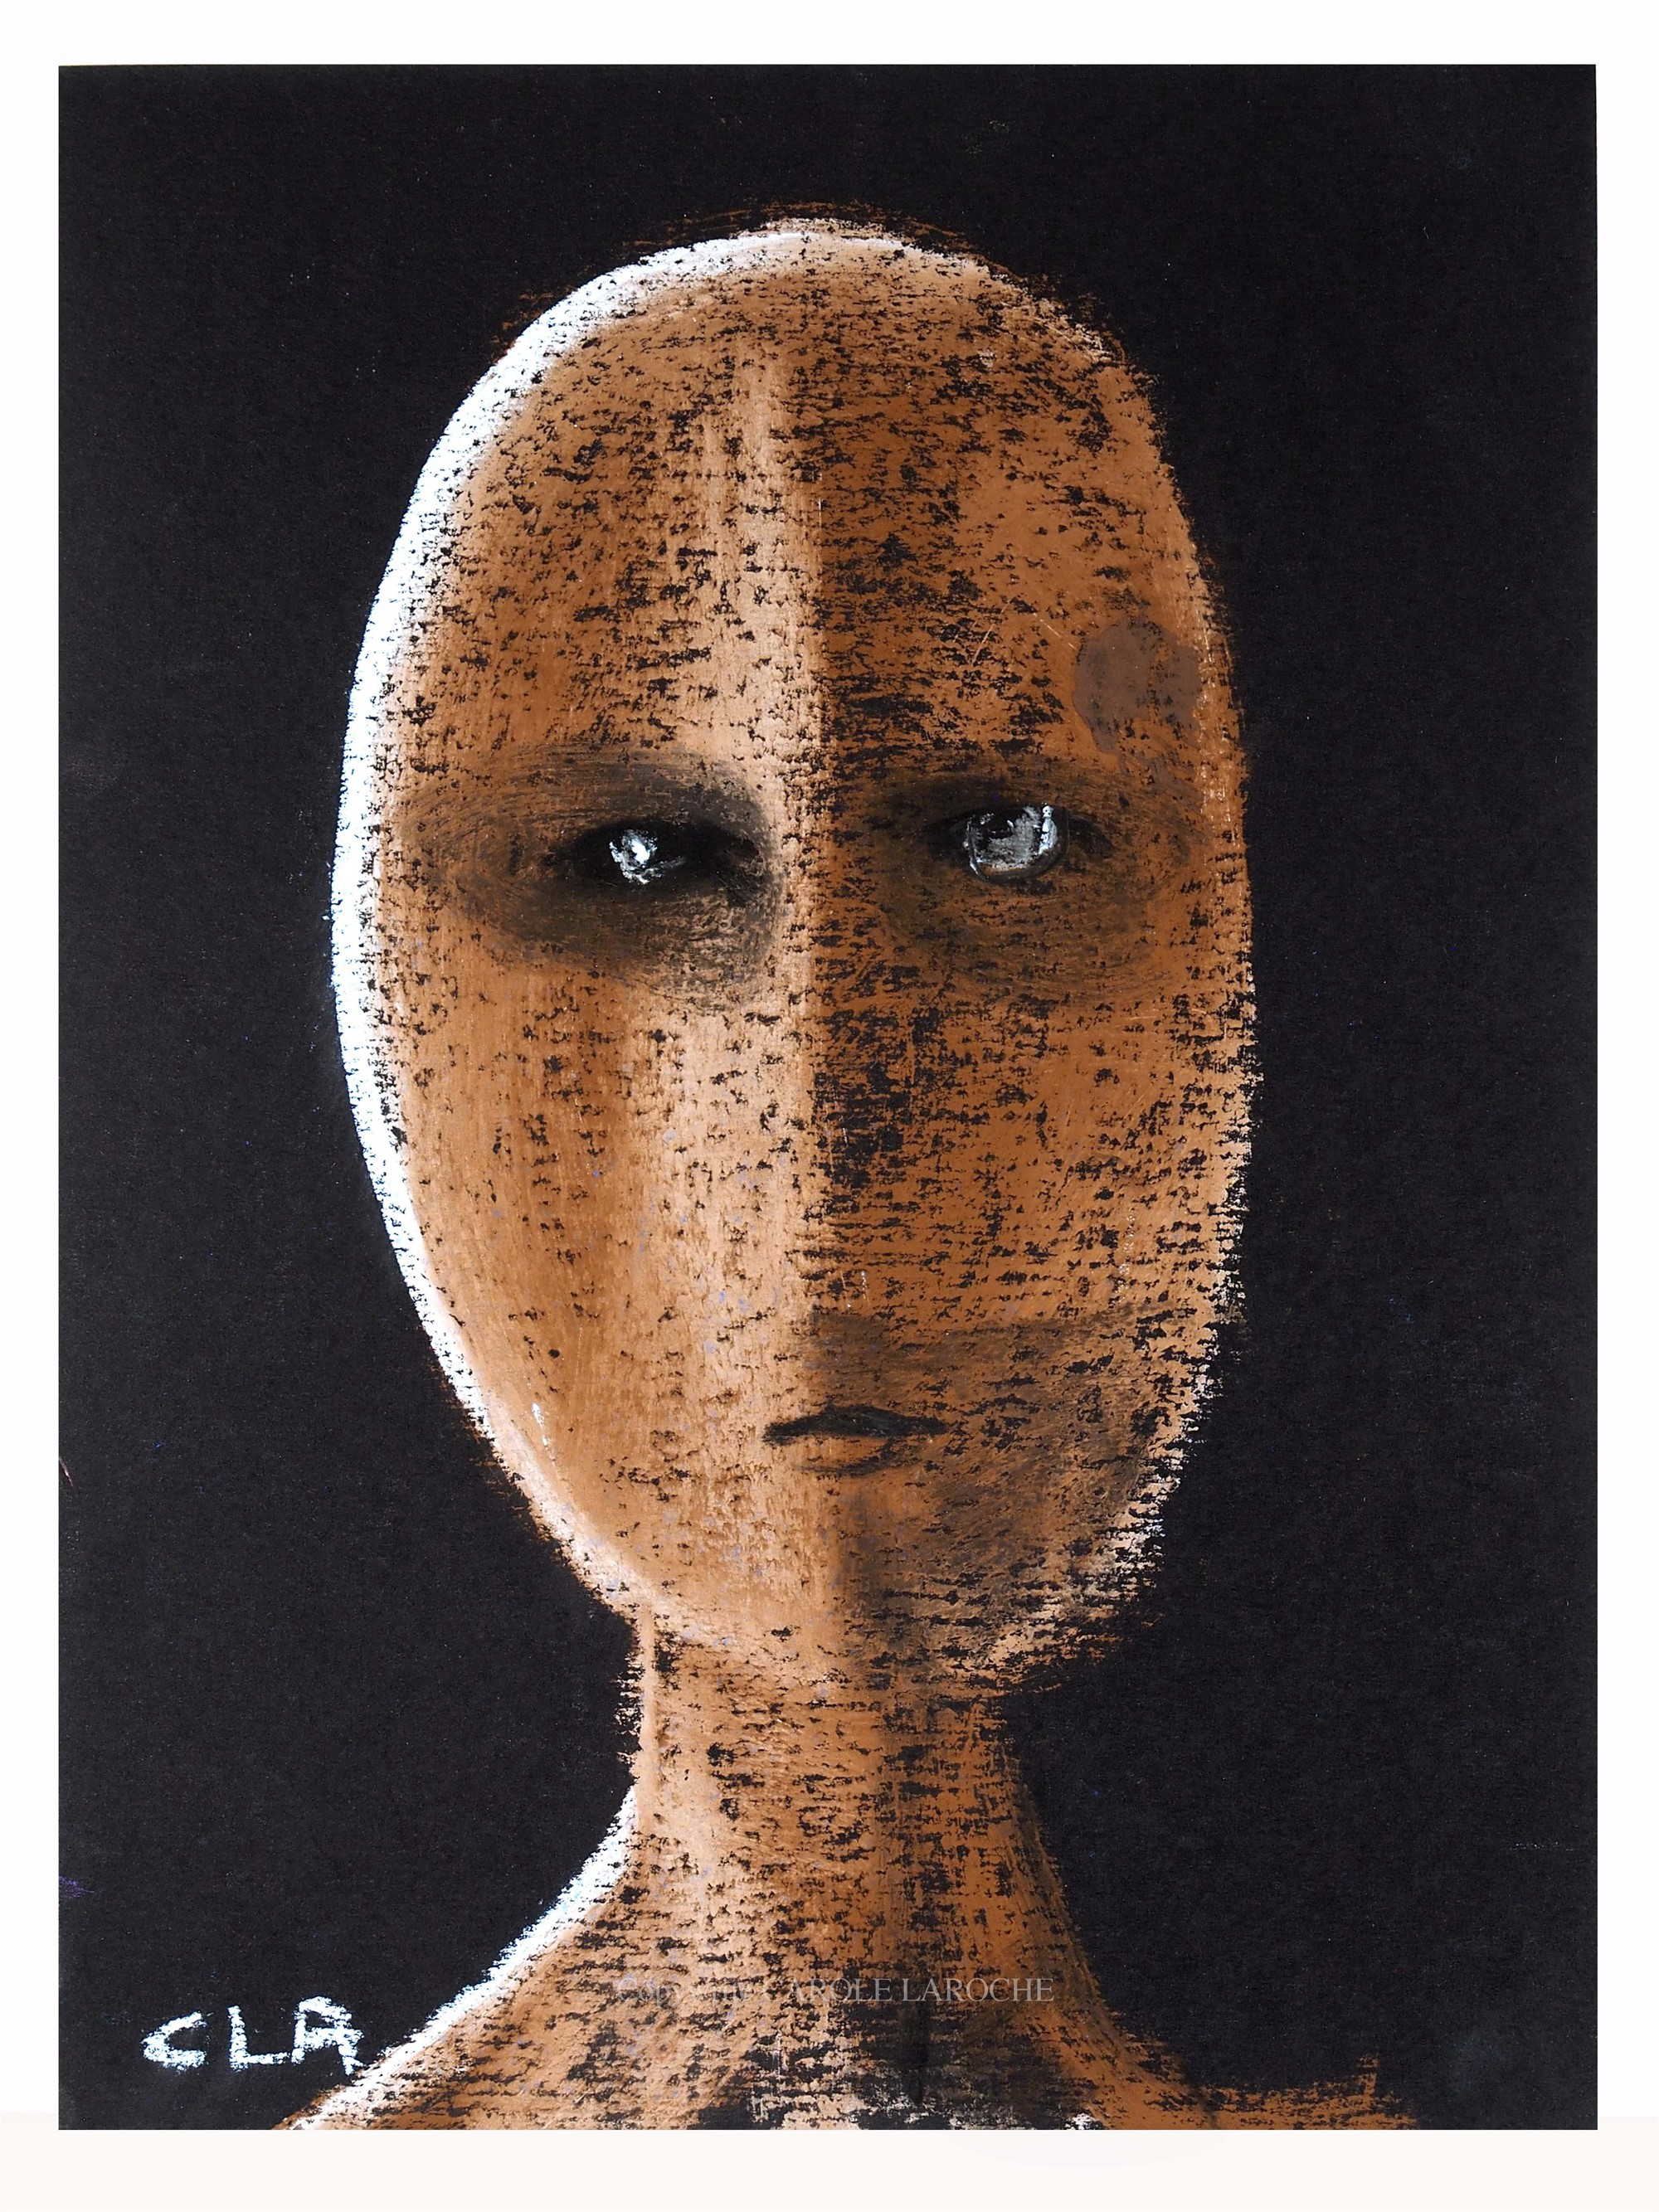 AMBER MESSENGER by Carole LaRoche